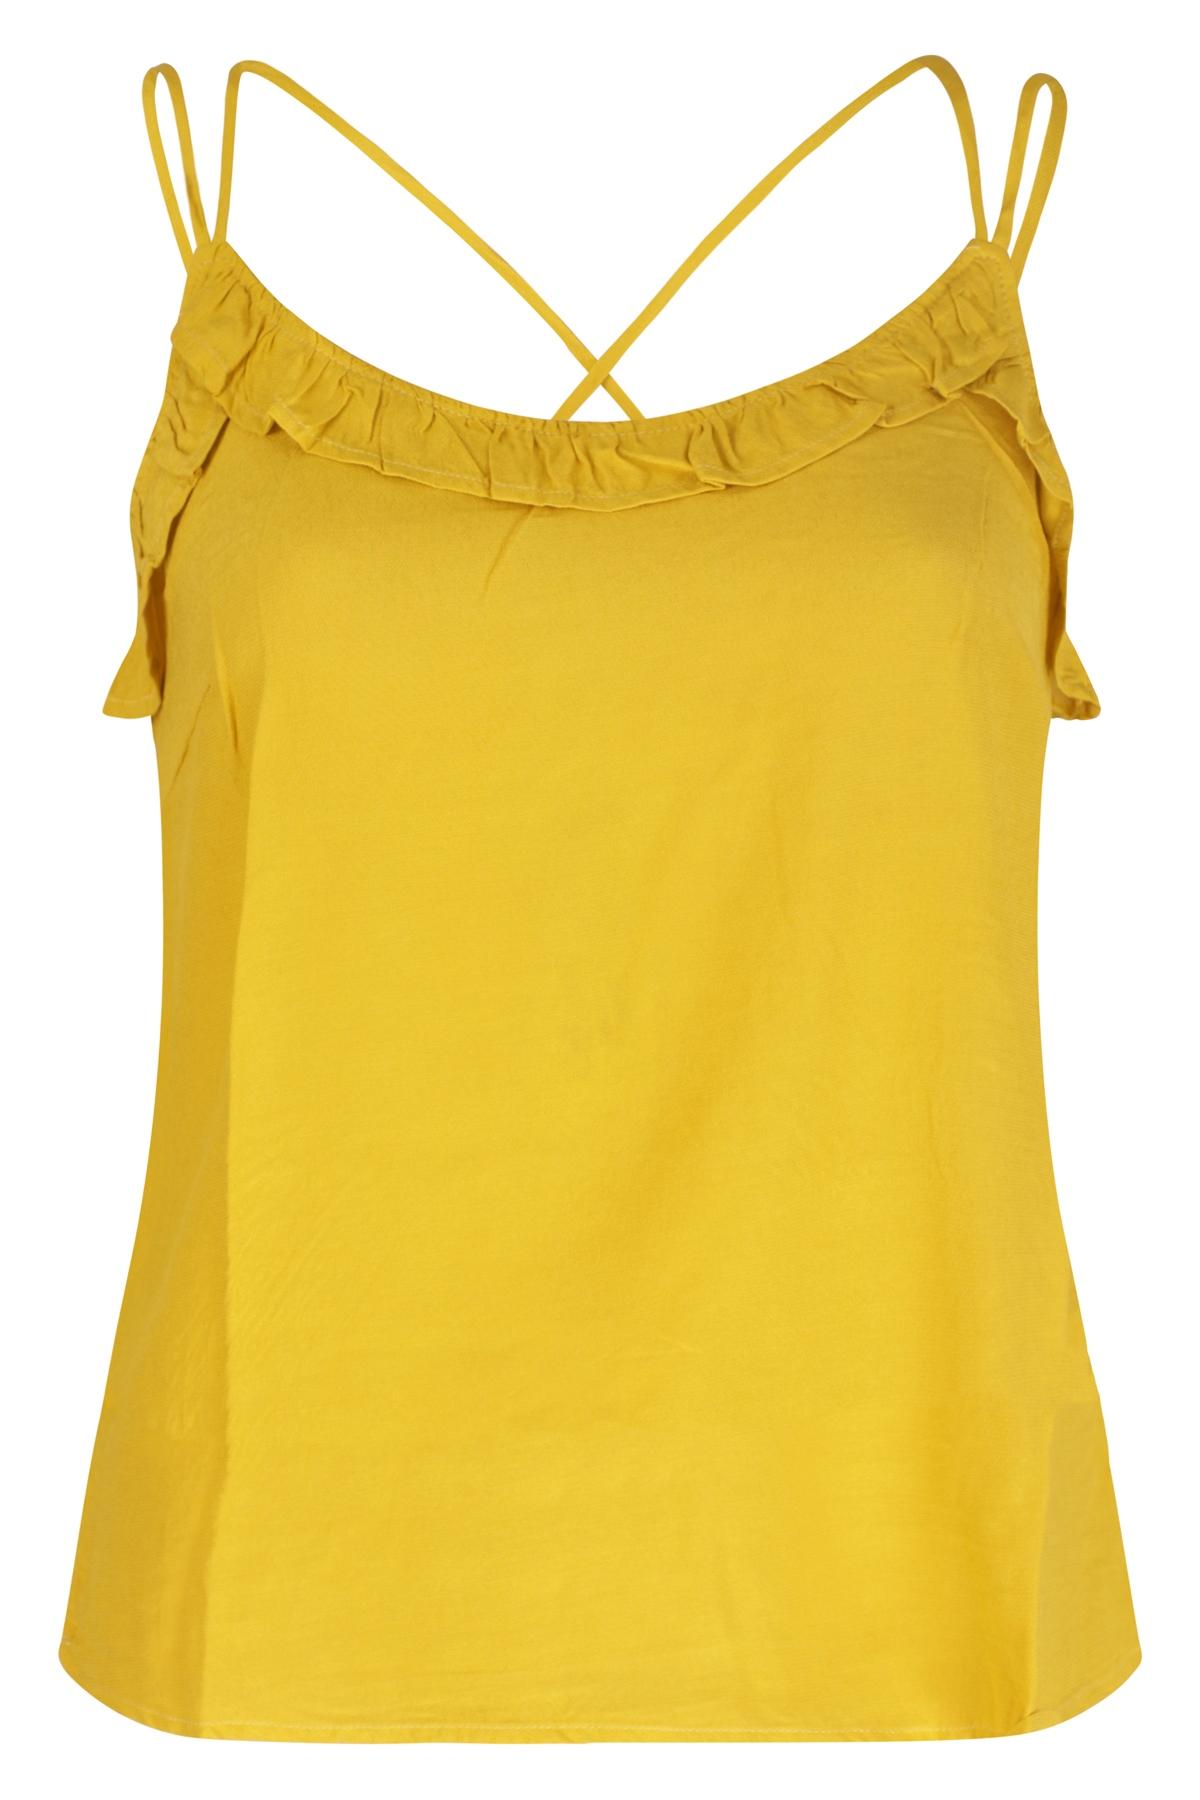 Femme9 Shirt - Top Geel Sanja